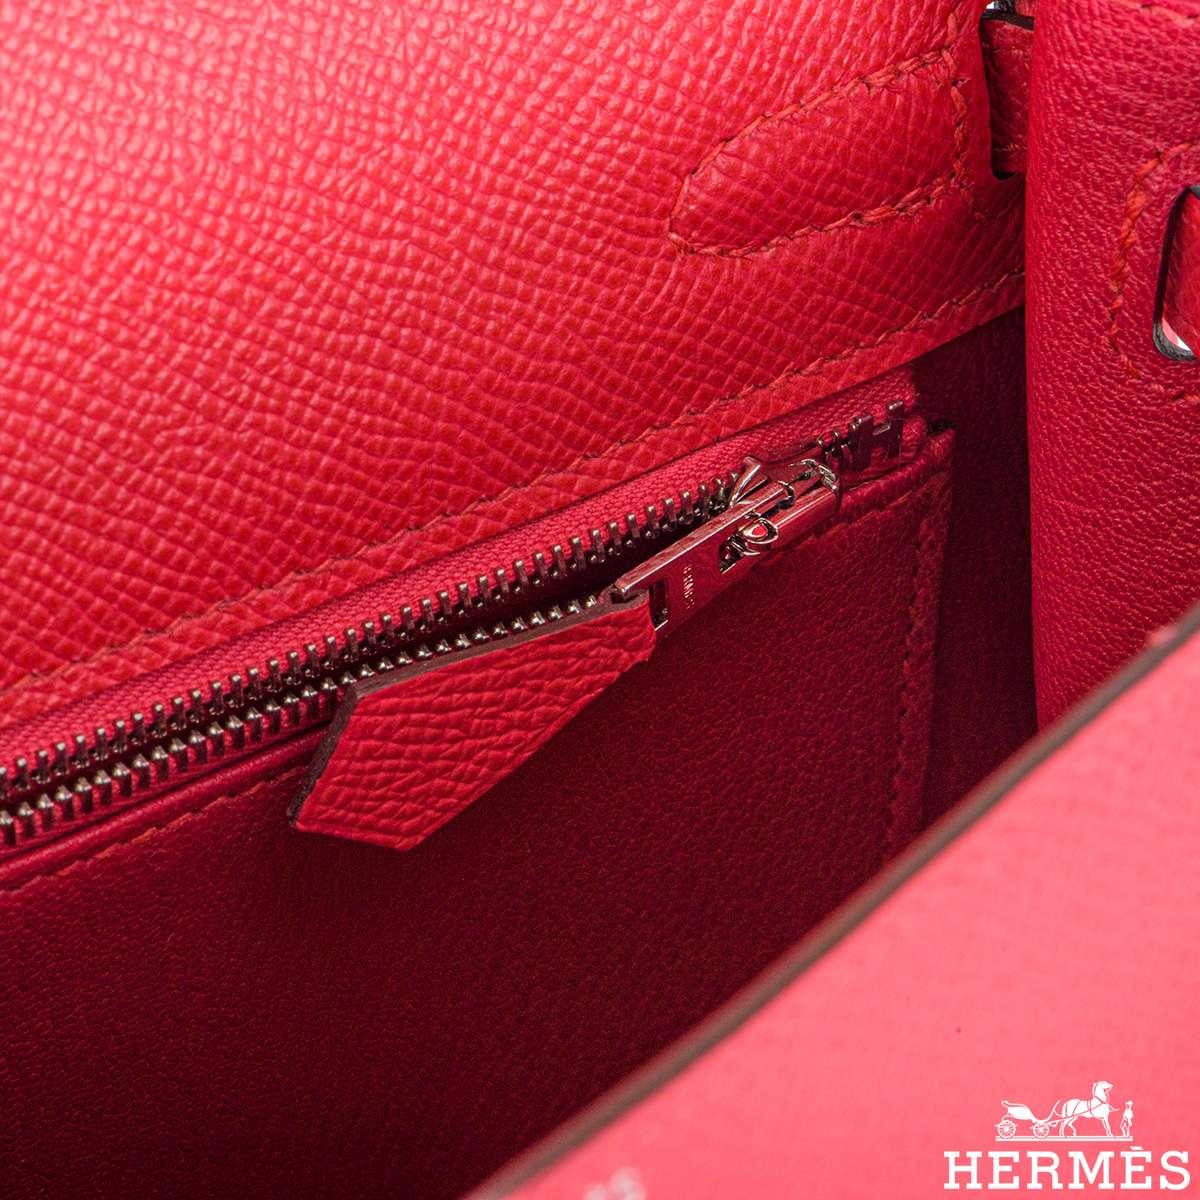 Hermès  Kelly II Sellier 25cm Epsom Rose Extreme PHW